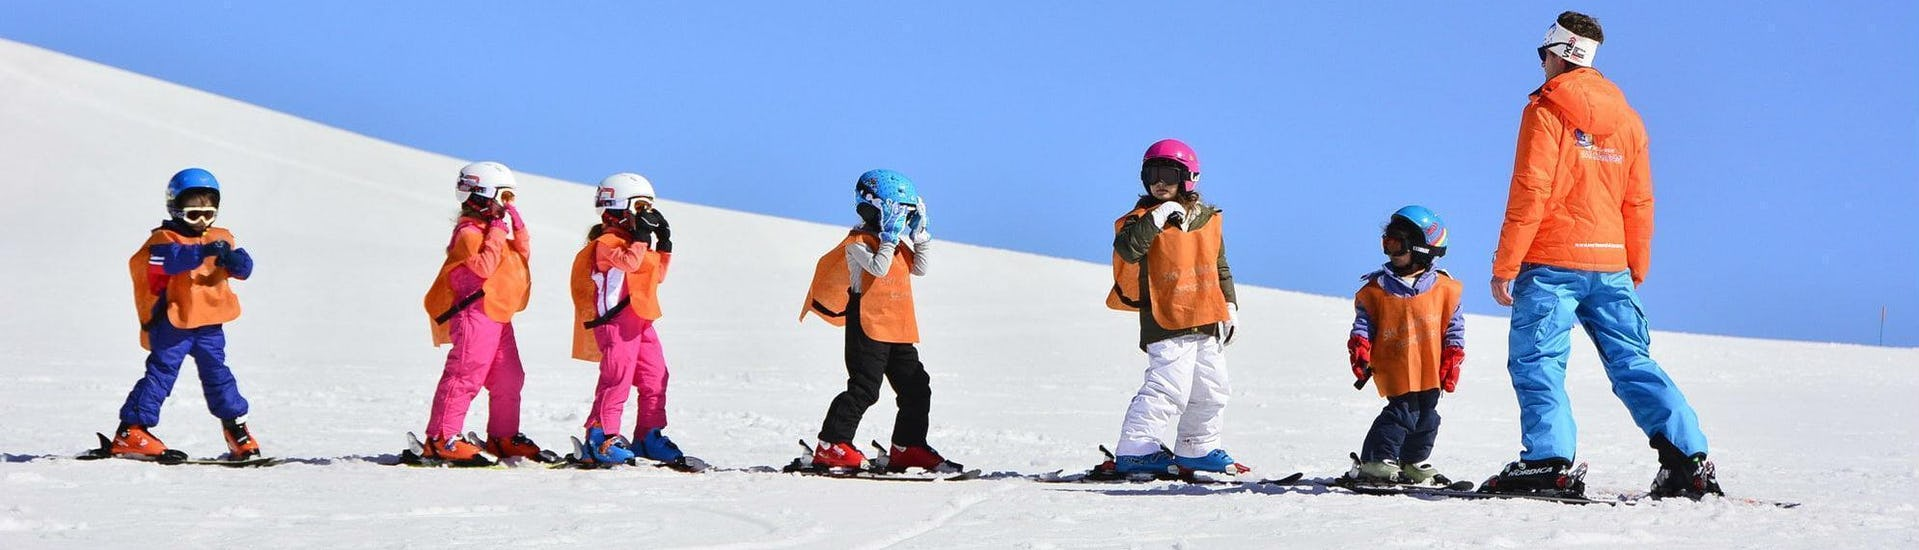 kids-ski-lessons-6-12-years-beginner-yes-academy-sestriere